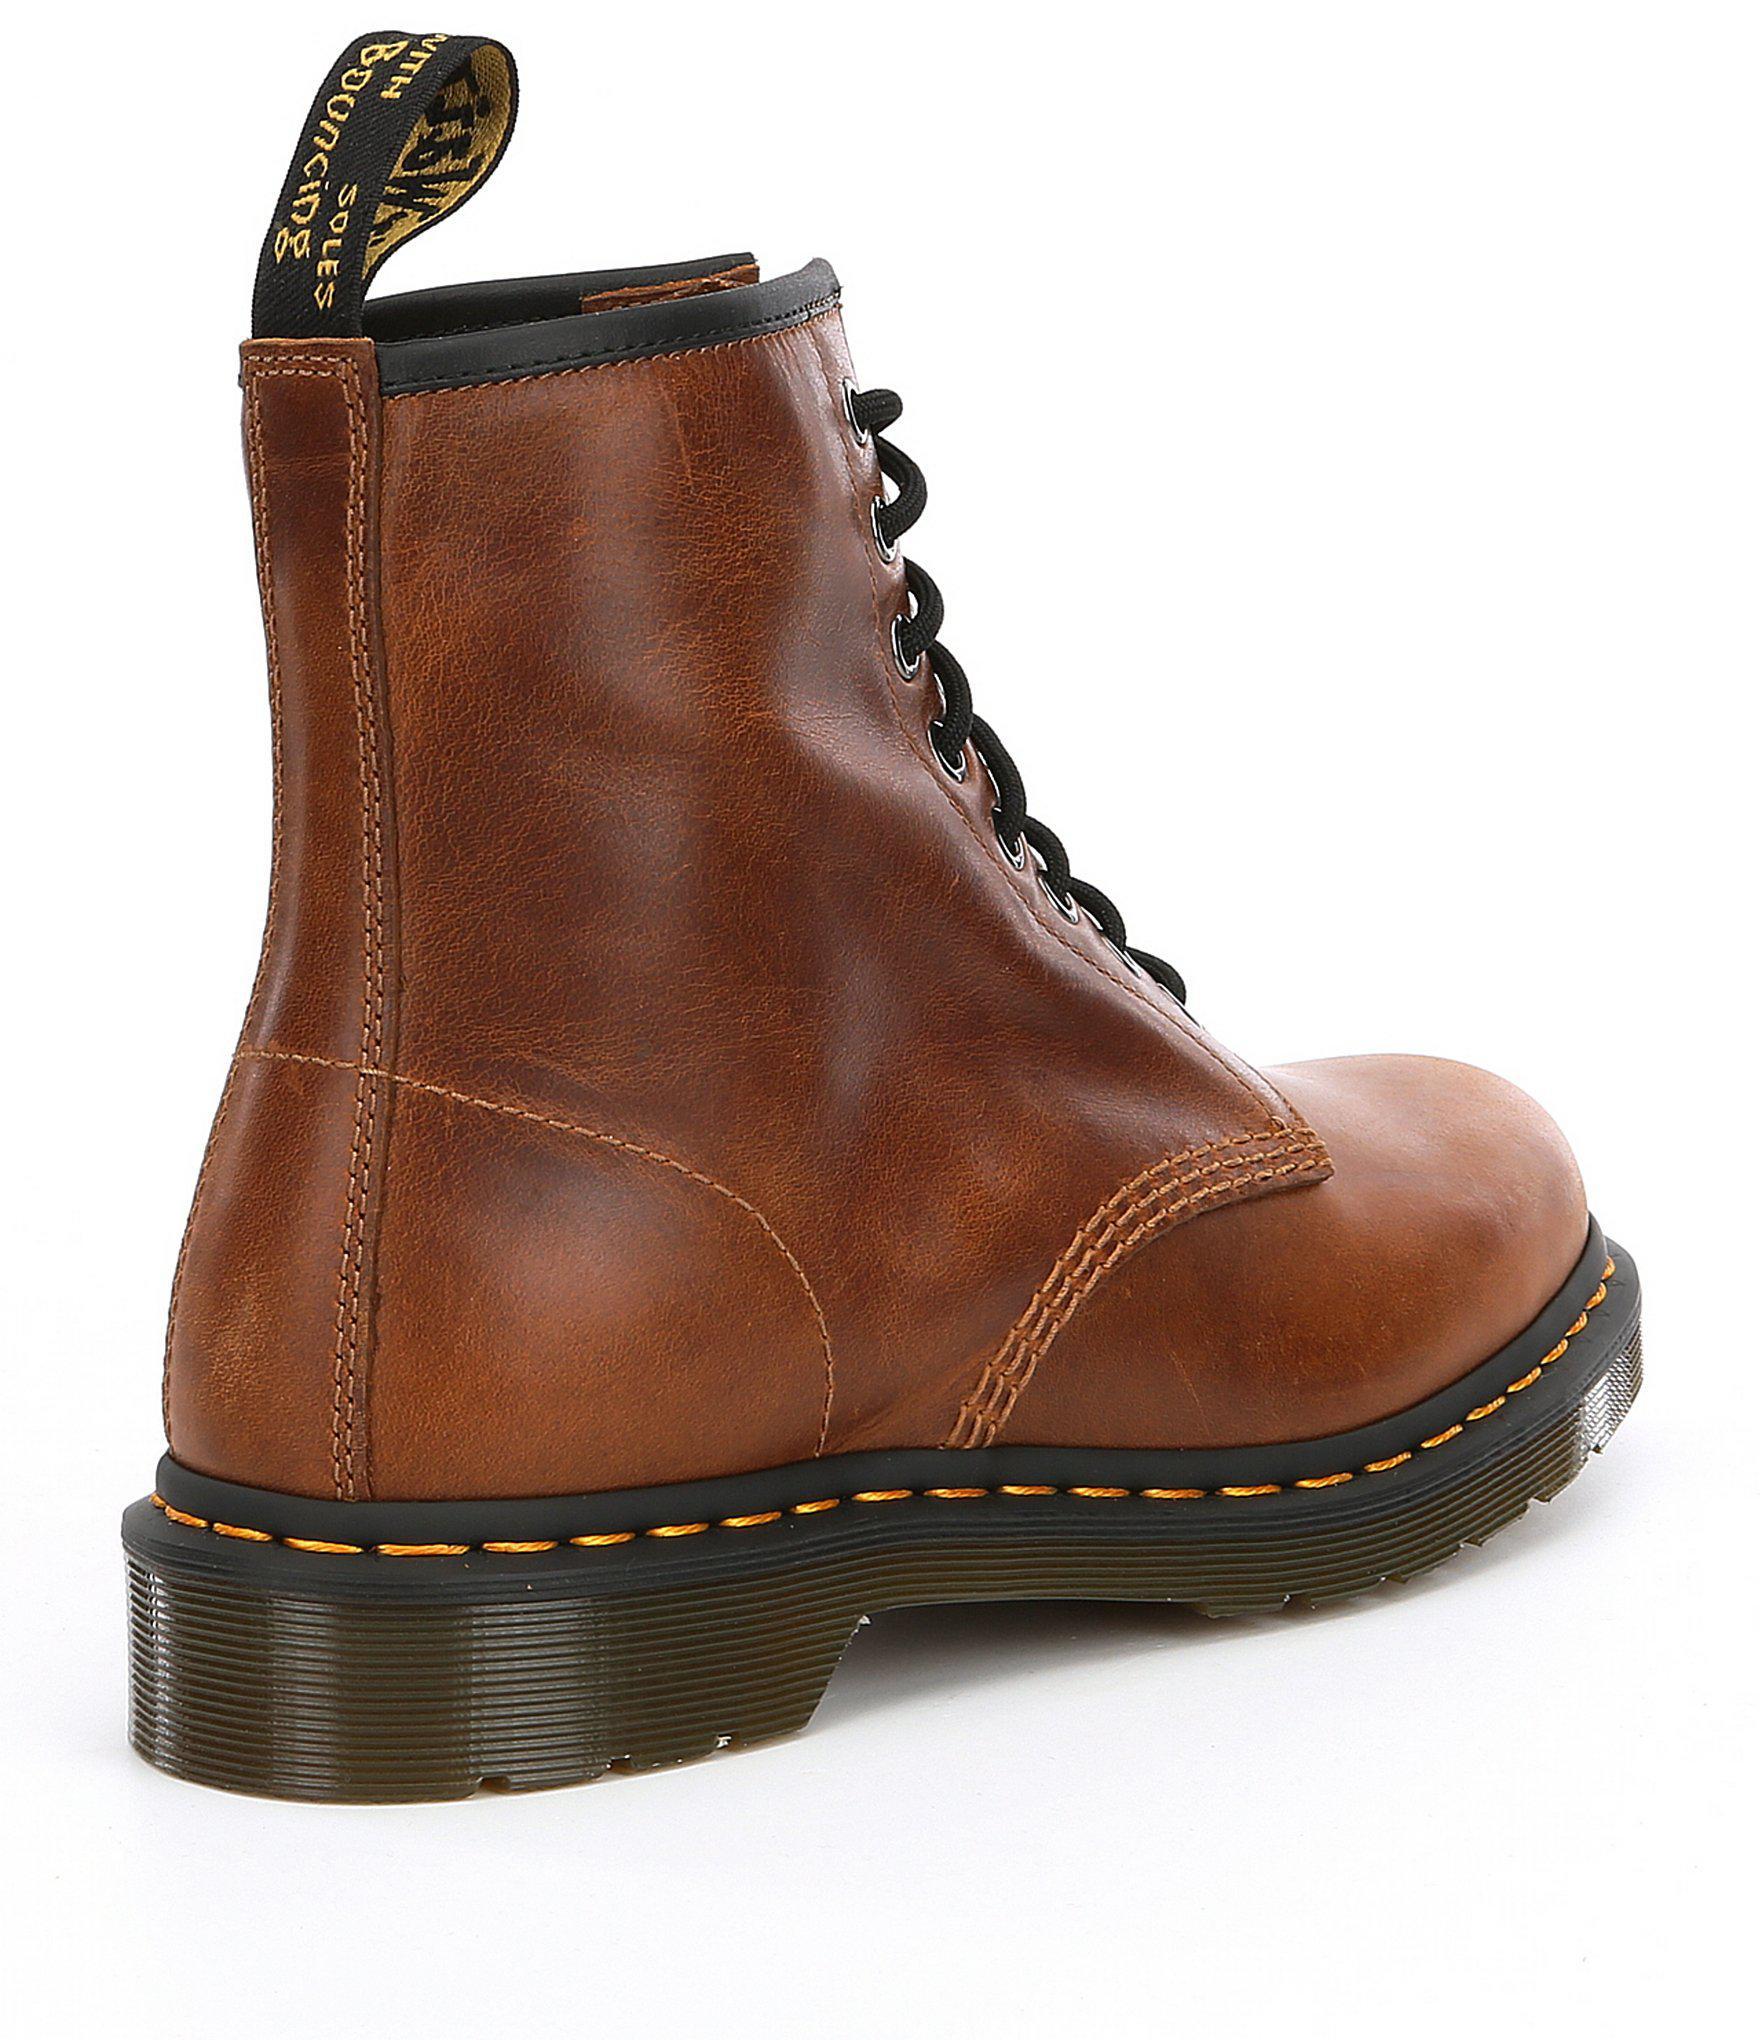 d56607331 Dr. Martens Men's 1460 Boots in Brown for Men - Lyst